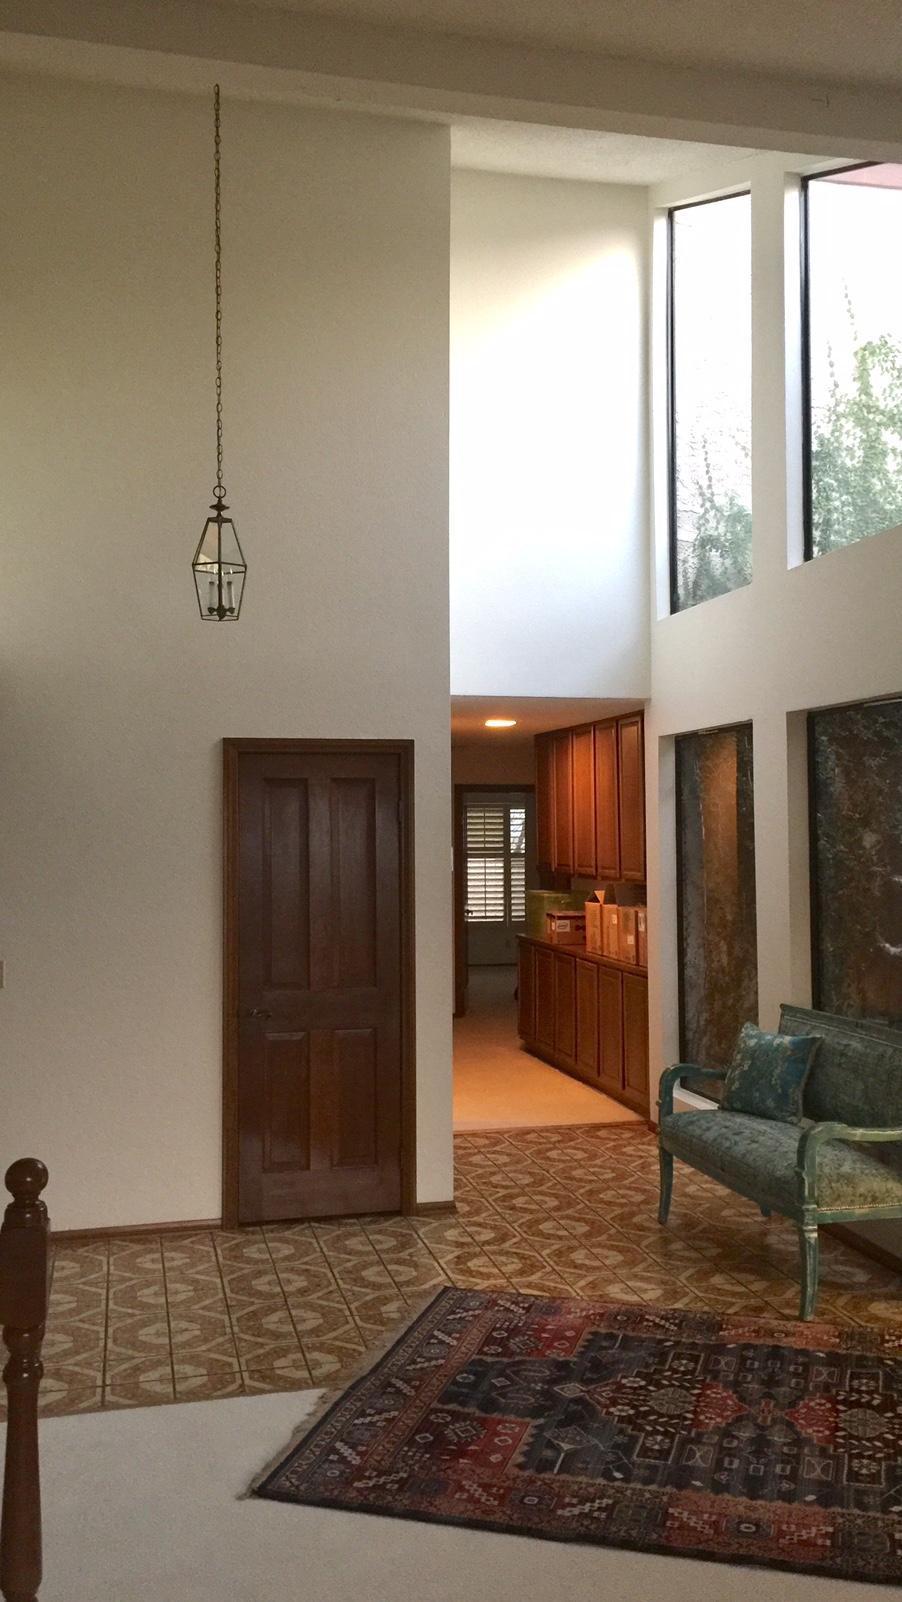 Entry hall with atrium windows